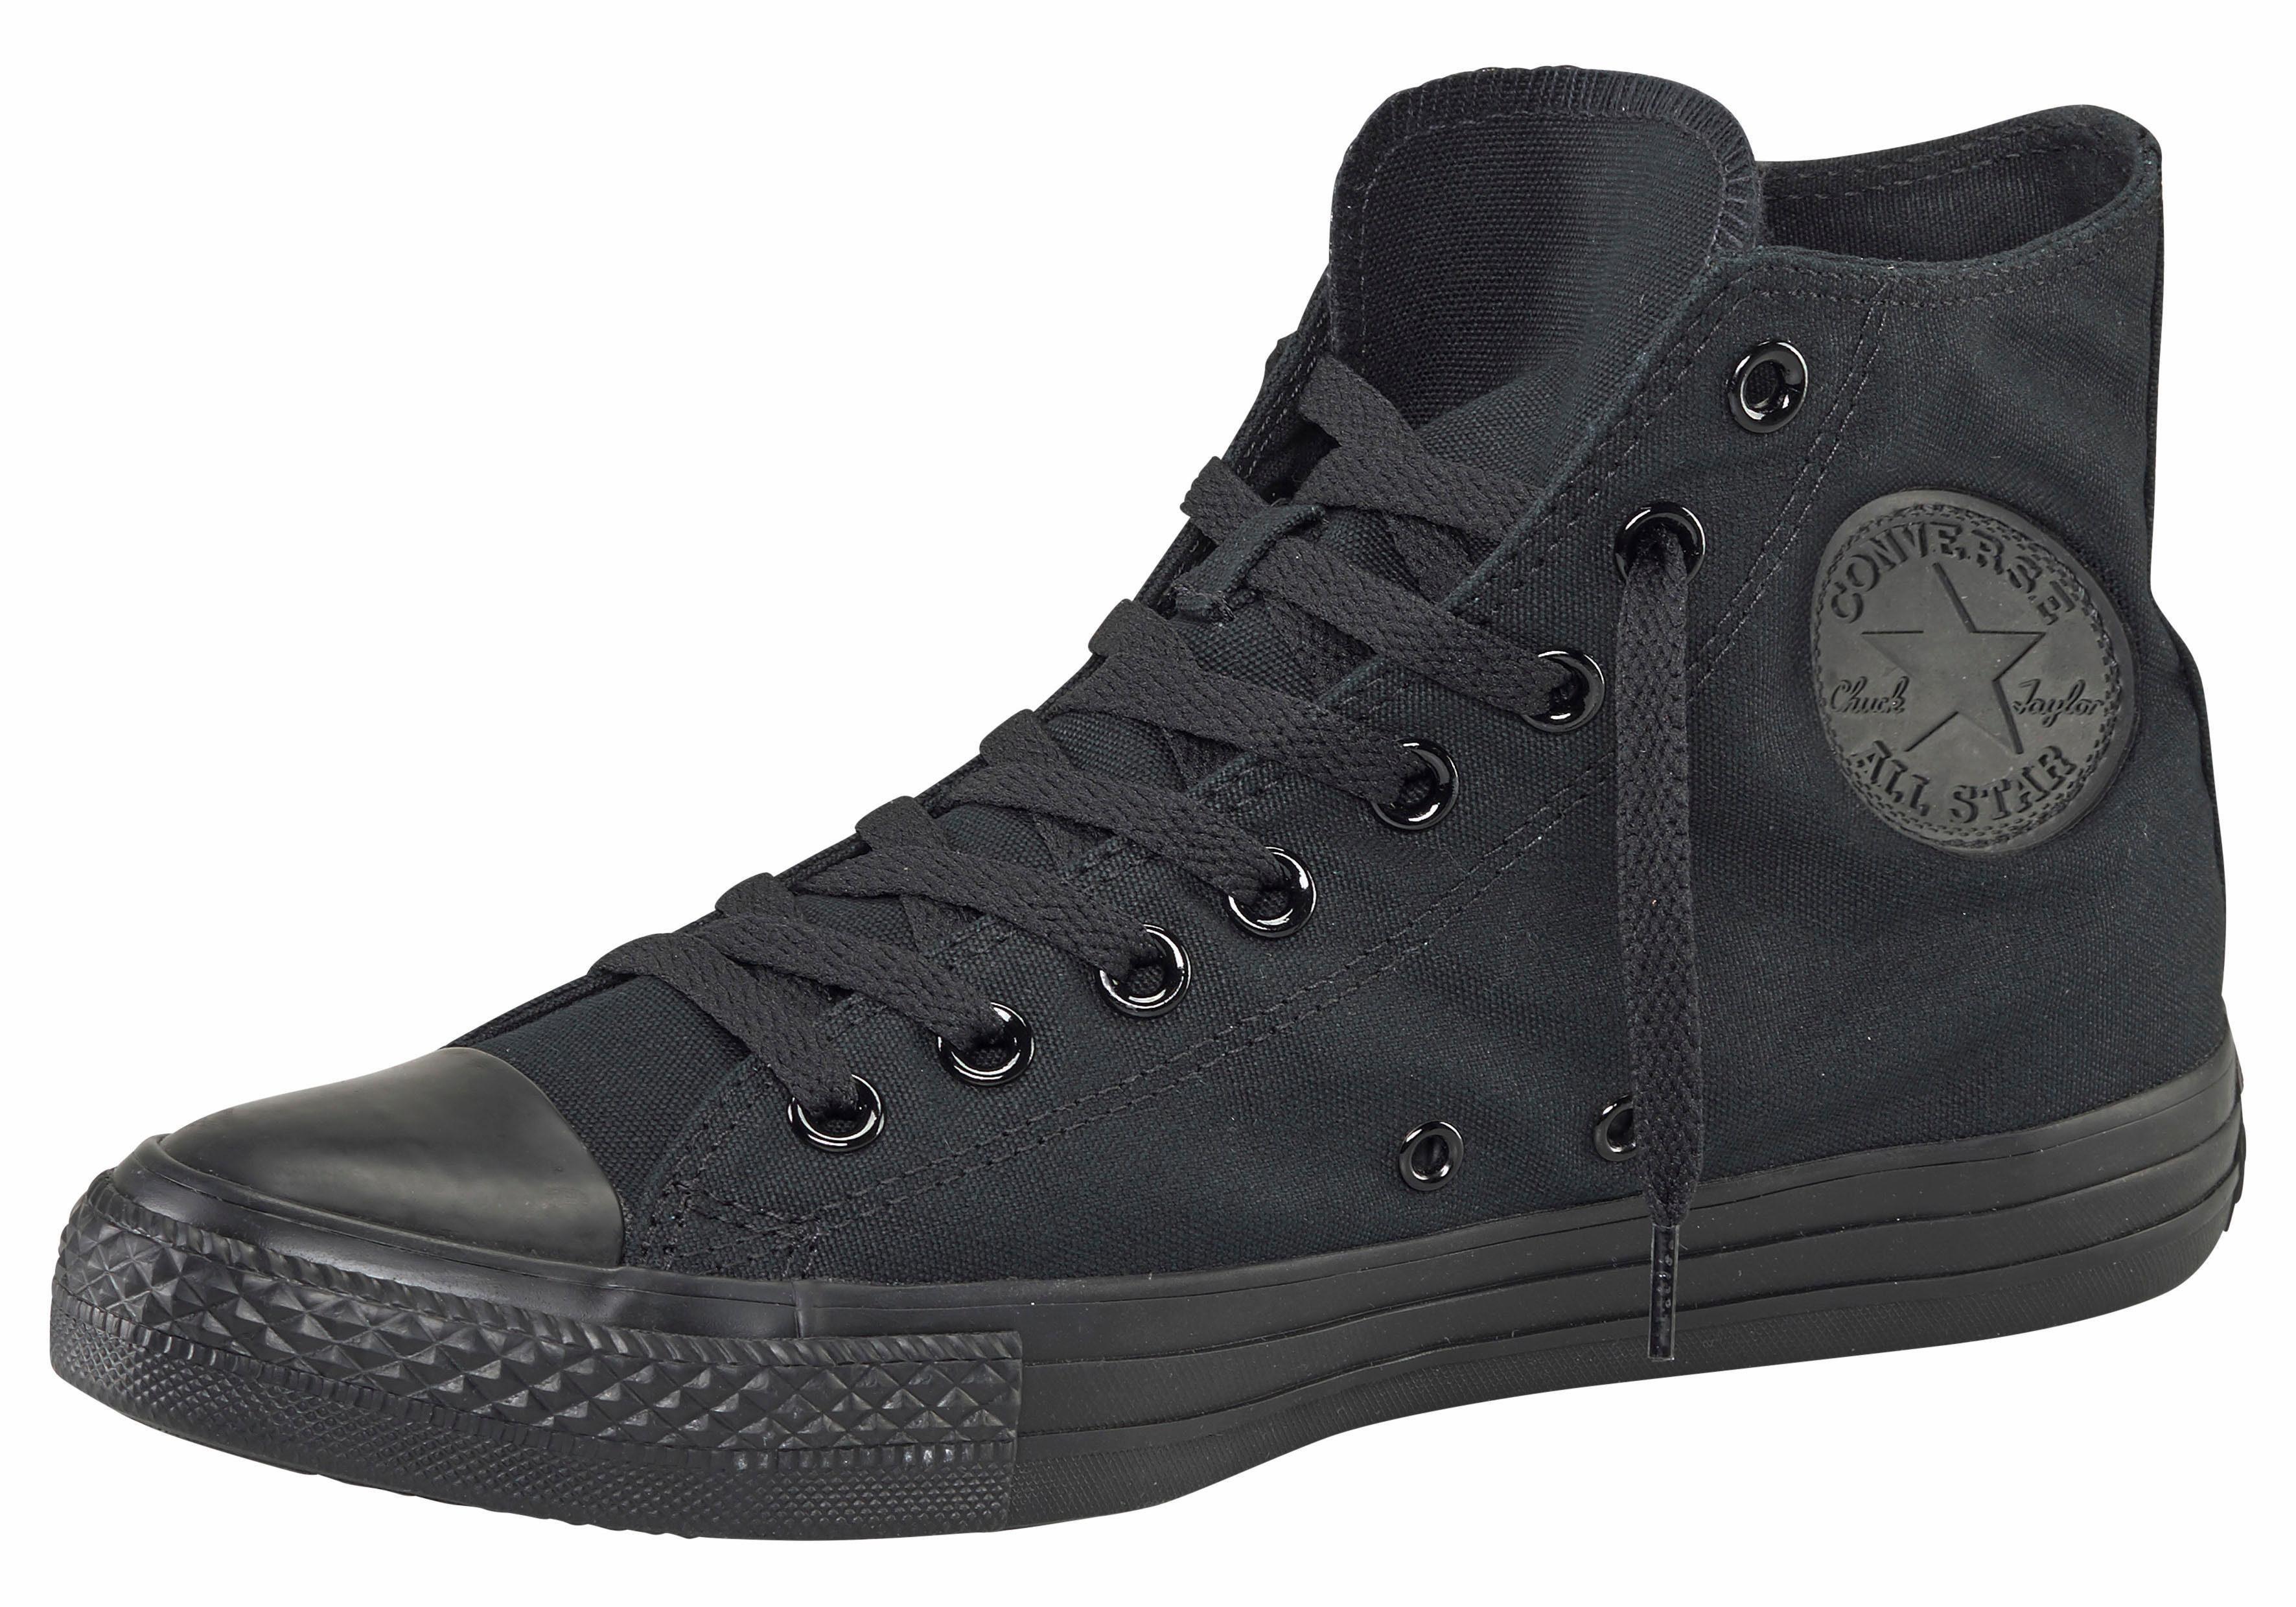 Converse »Chuck Taylor All Star Seasonal Hi« Sneaker online kaufen | OTTO